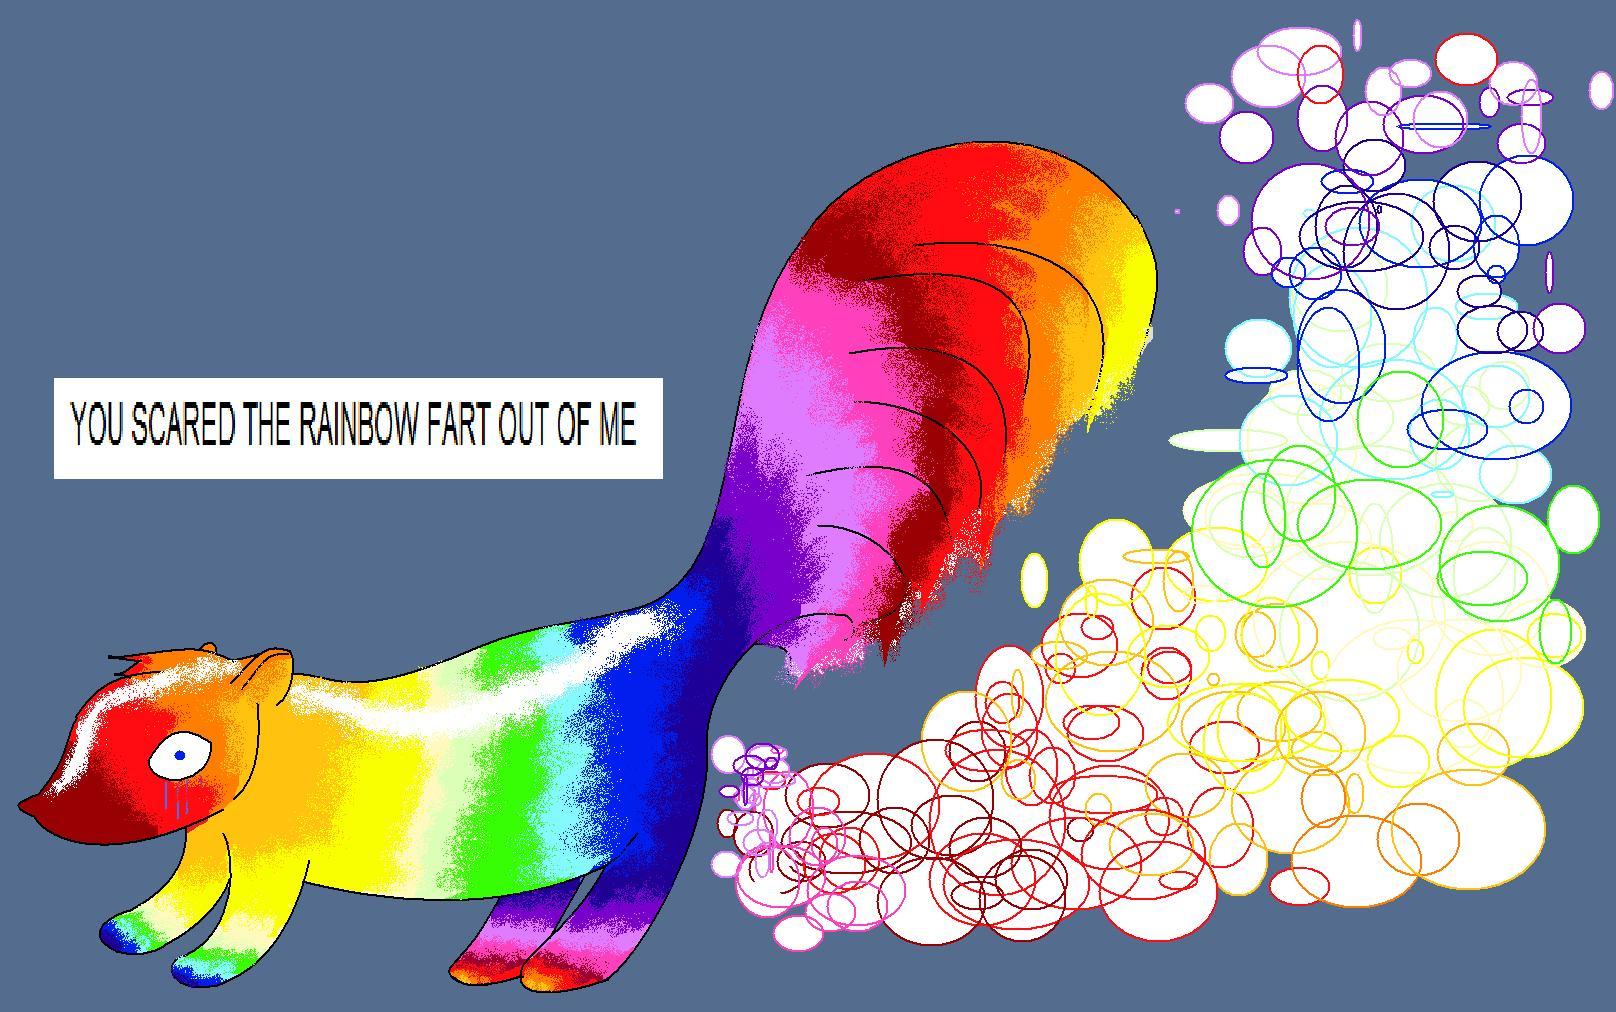 rainbow skunk by thegod2b on deviantart